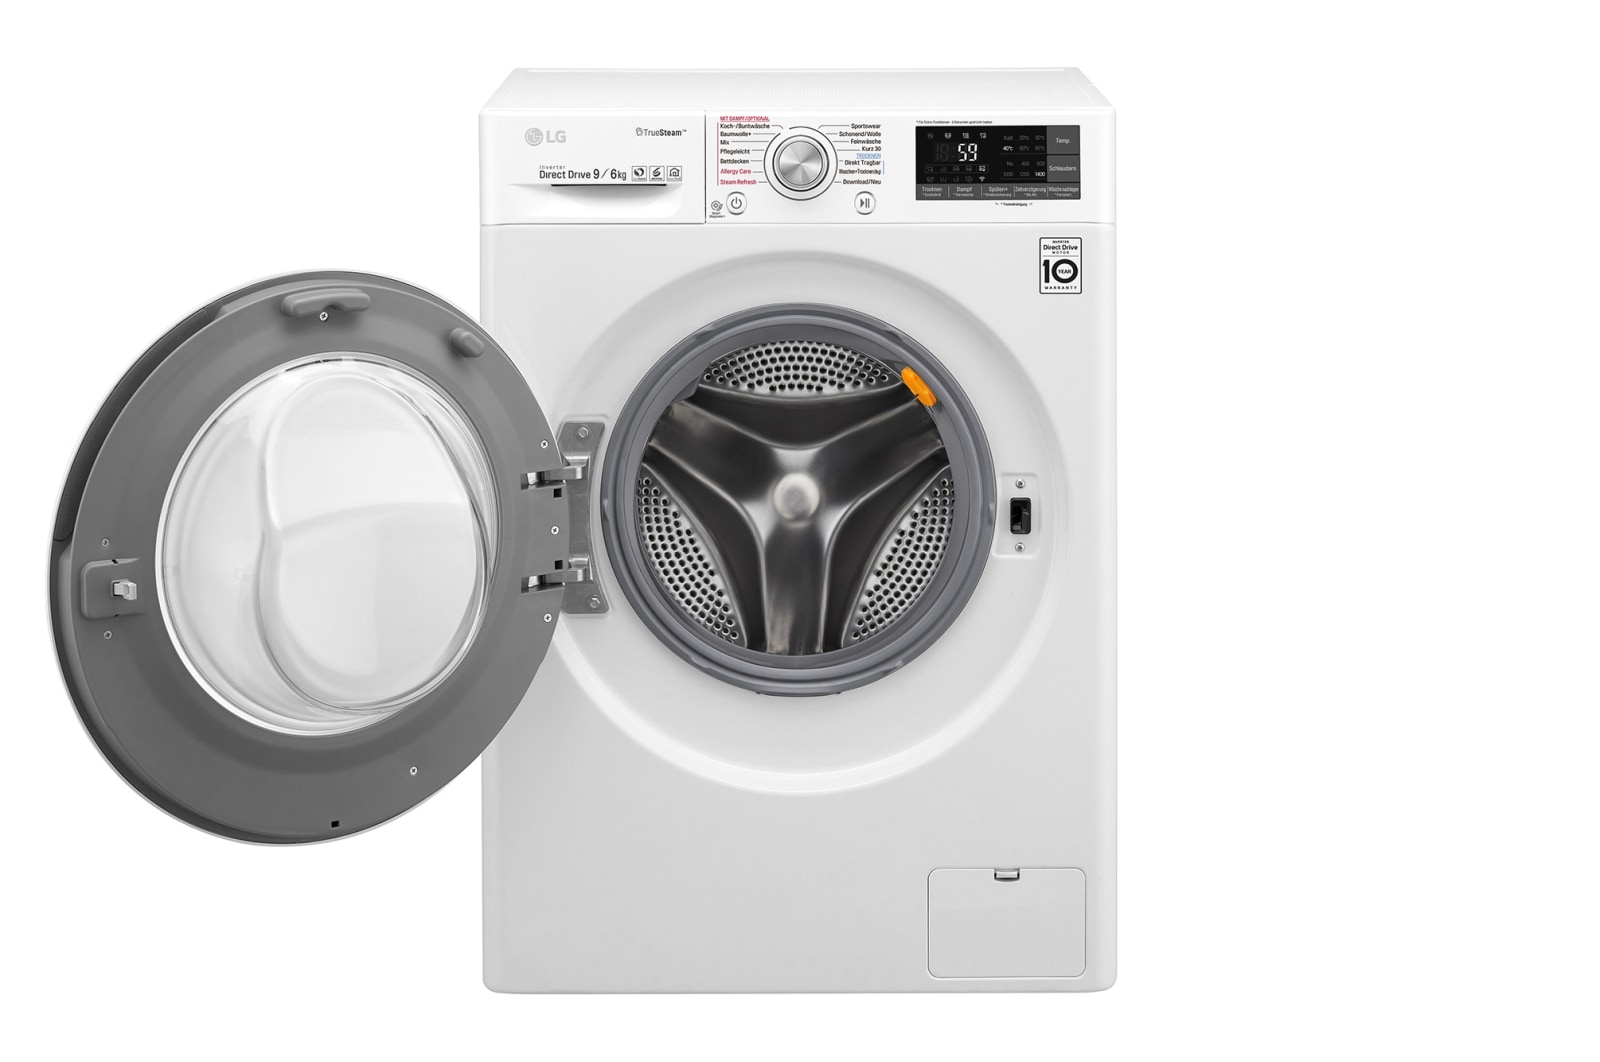 Lg waschtrockner kg waschen kg trocknen truesteam™ wlan